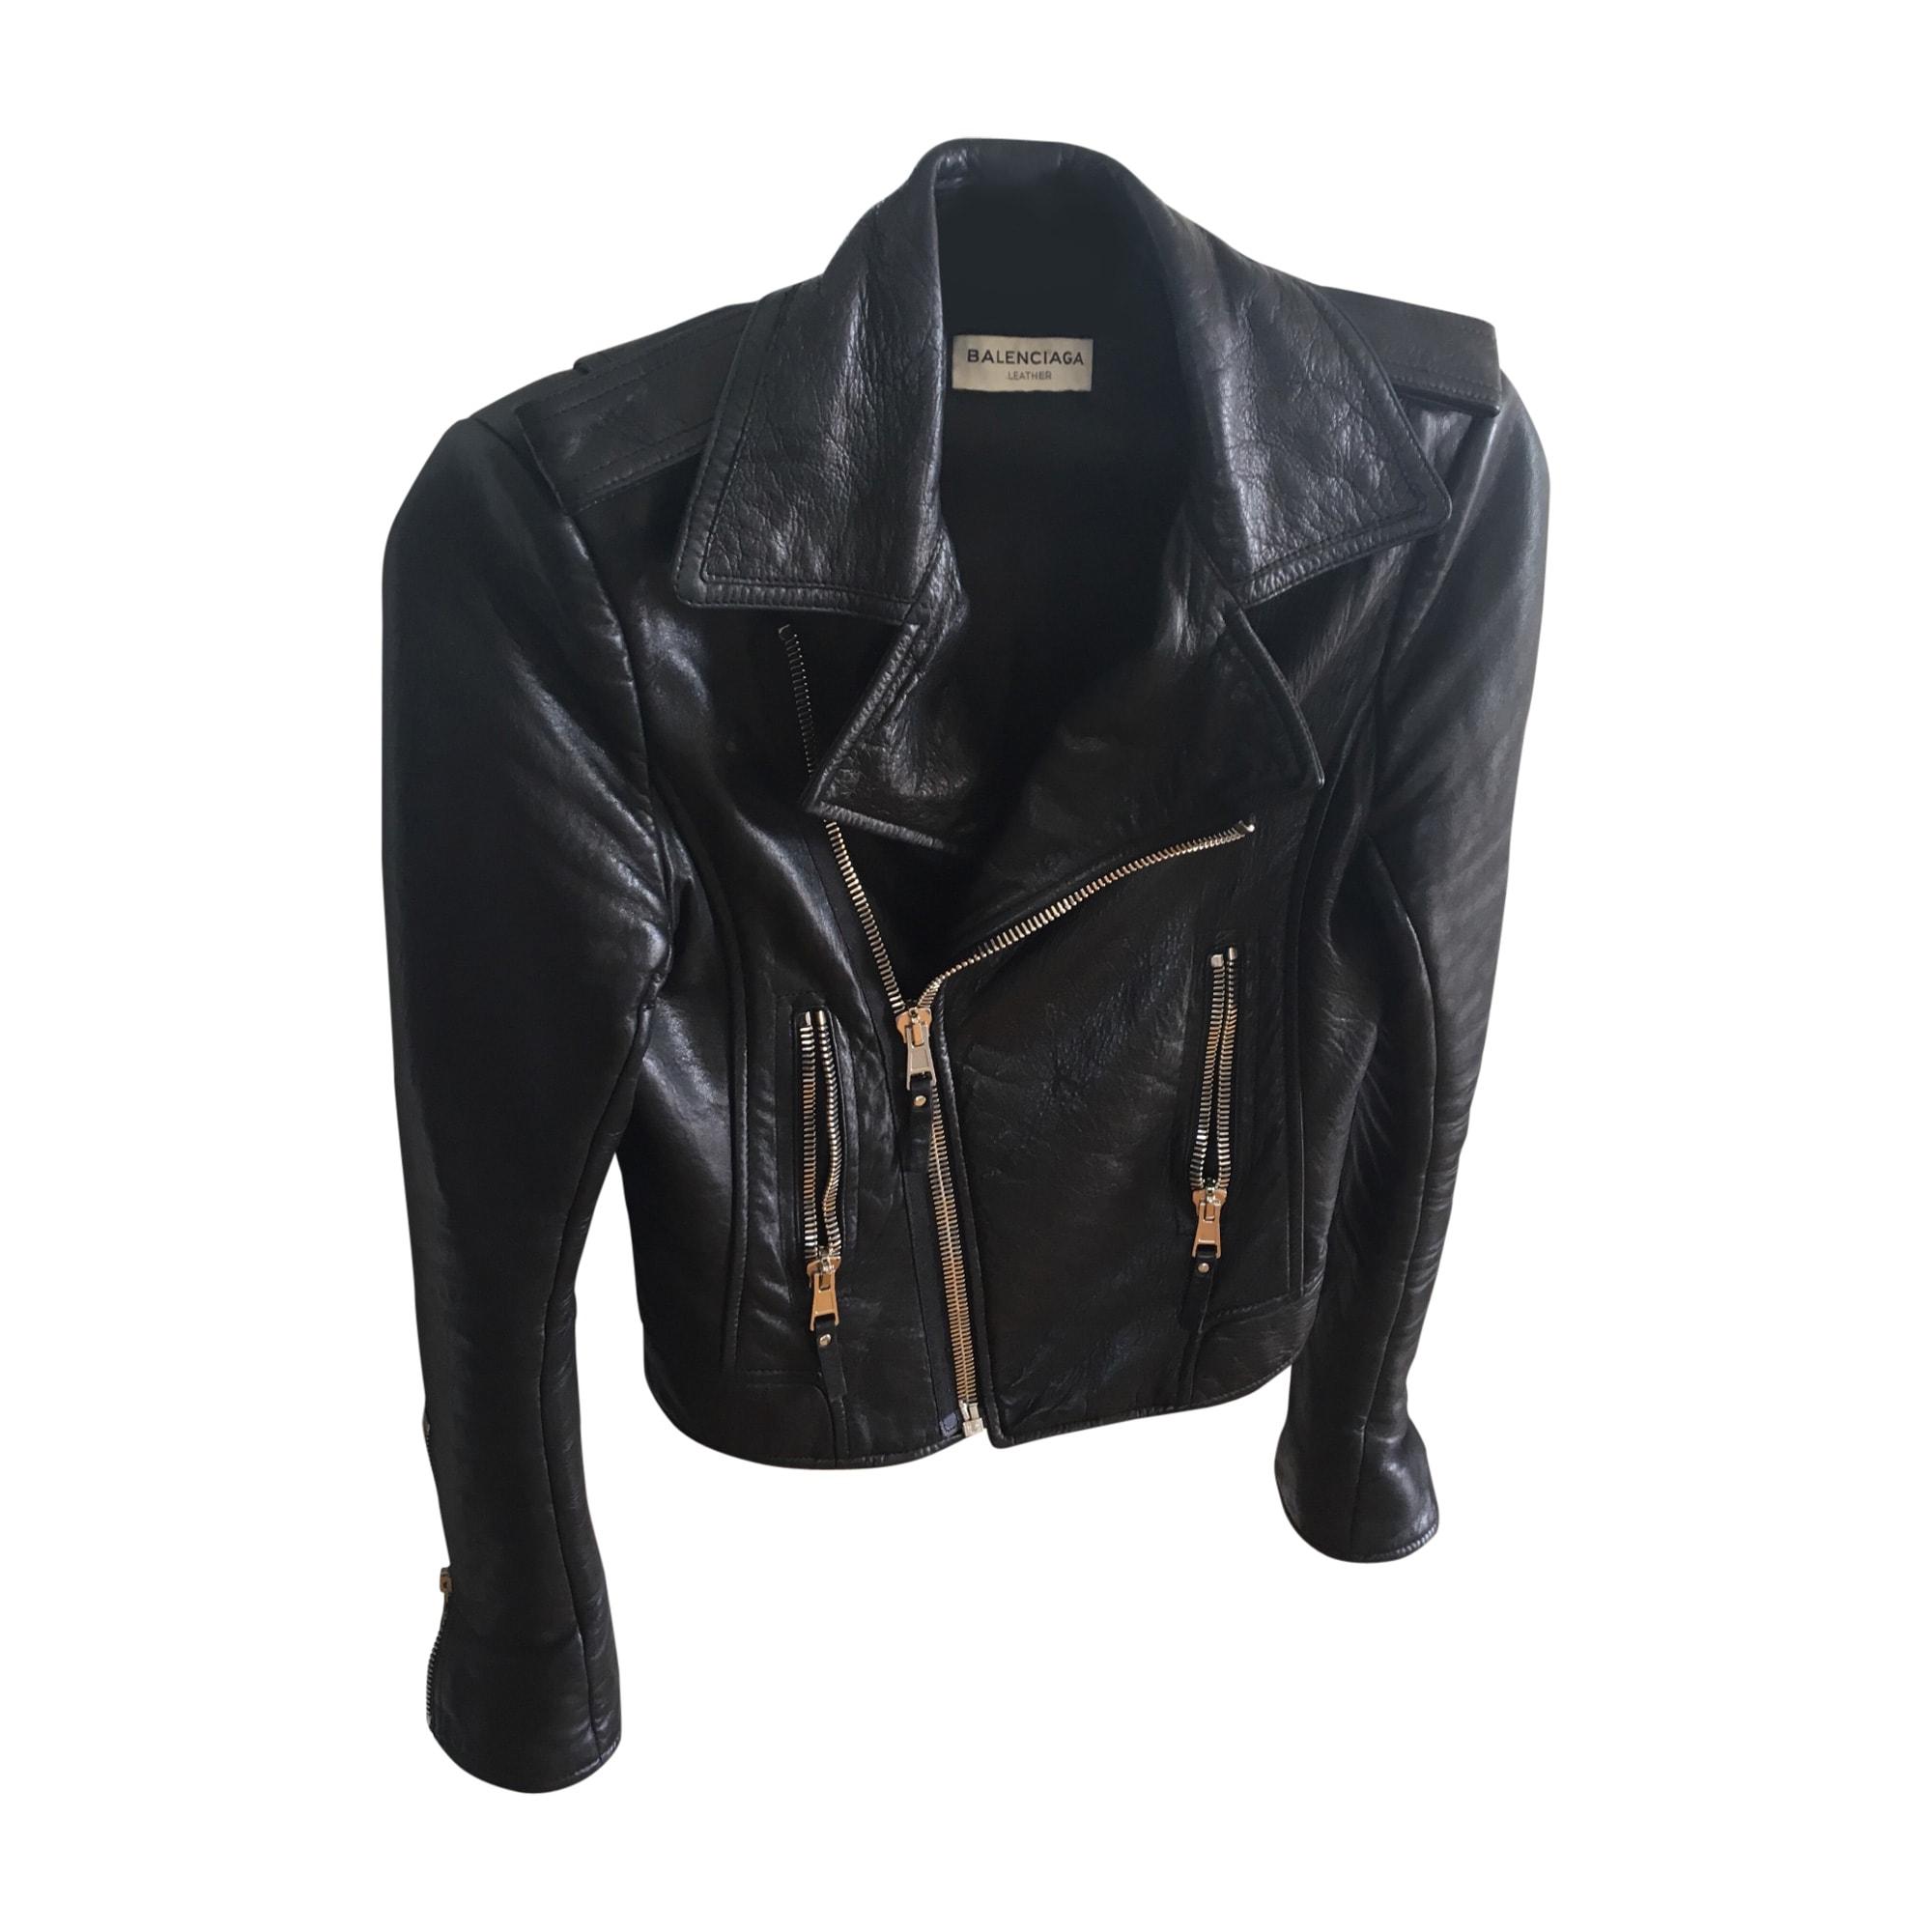 Leather Zipped Jacket BALENCIAGA Black